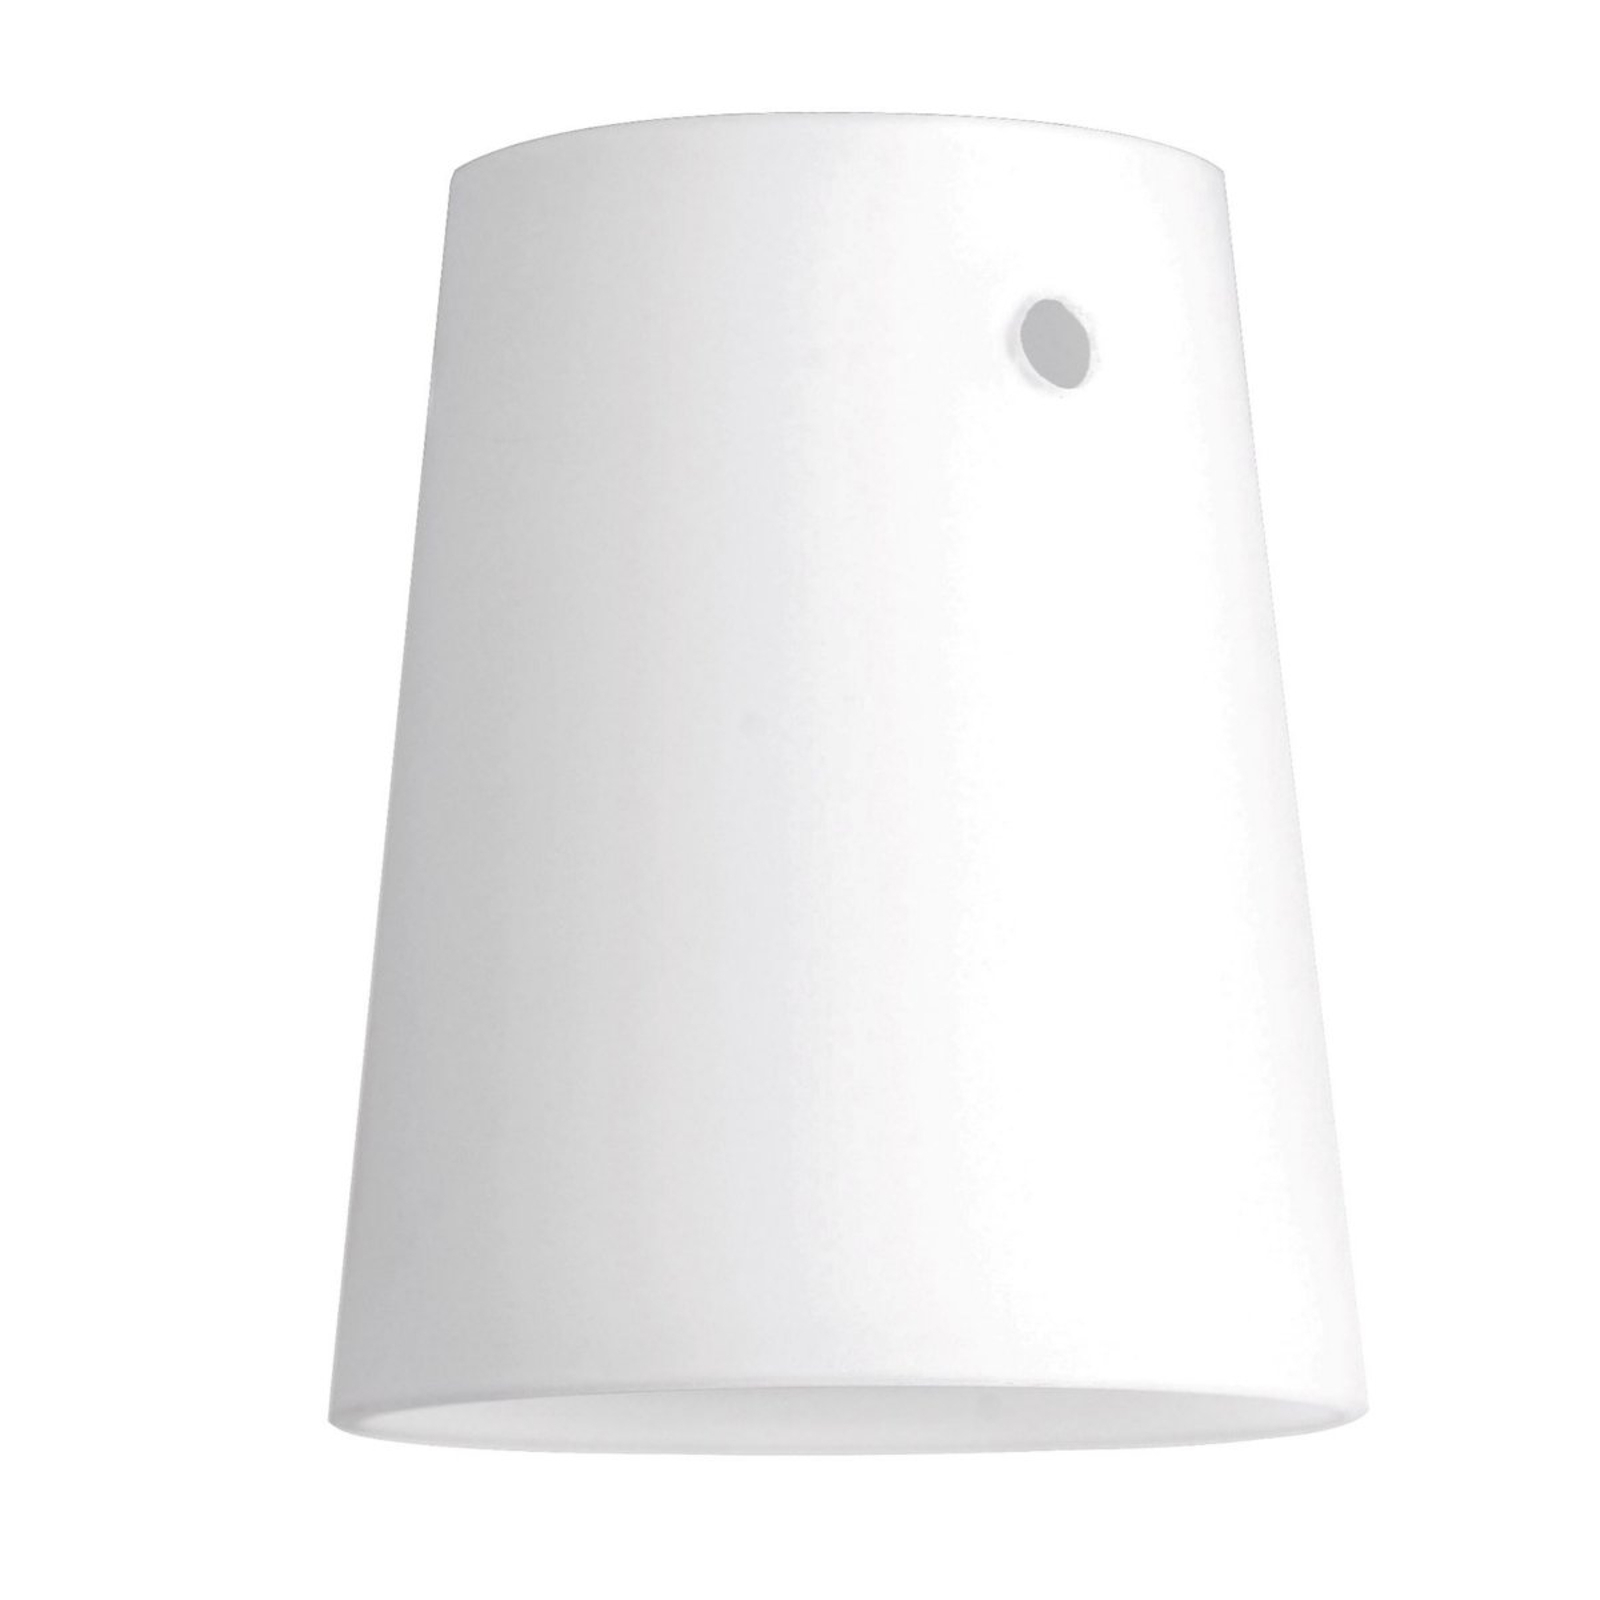 Schirm zu LED-Spot HV-track4, konisch 7 cm